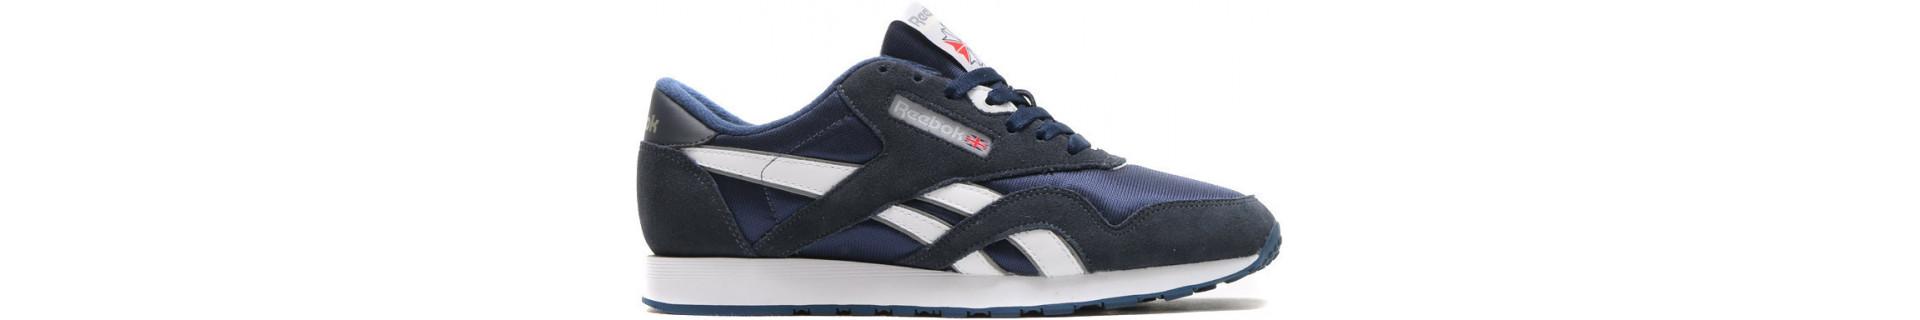 Adidas, Nike, Rebook, Puma, Vans, Chiruca men's shoes